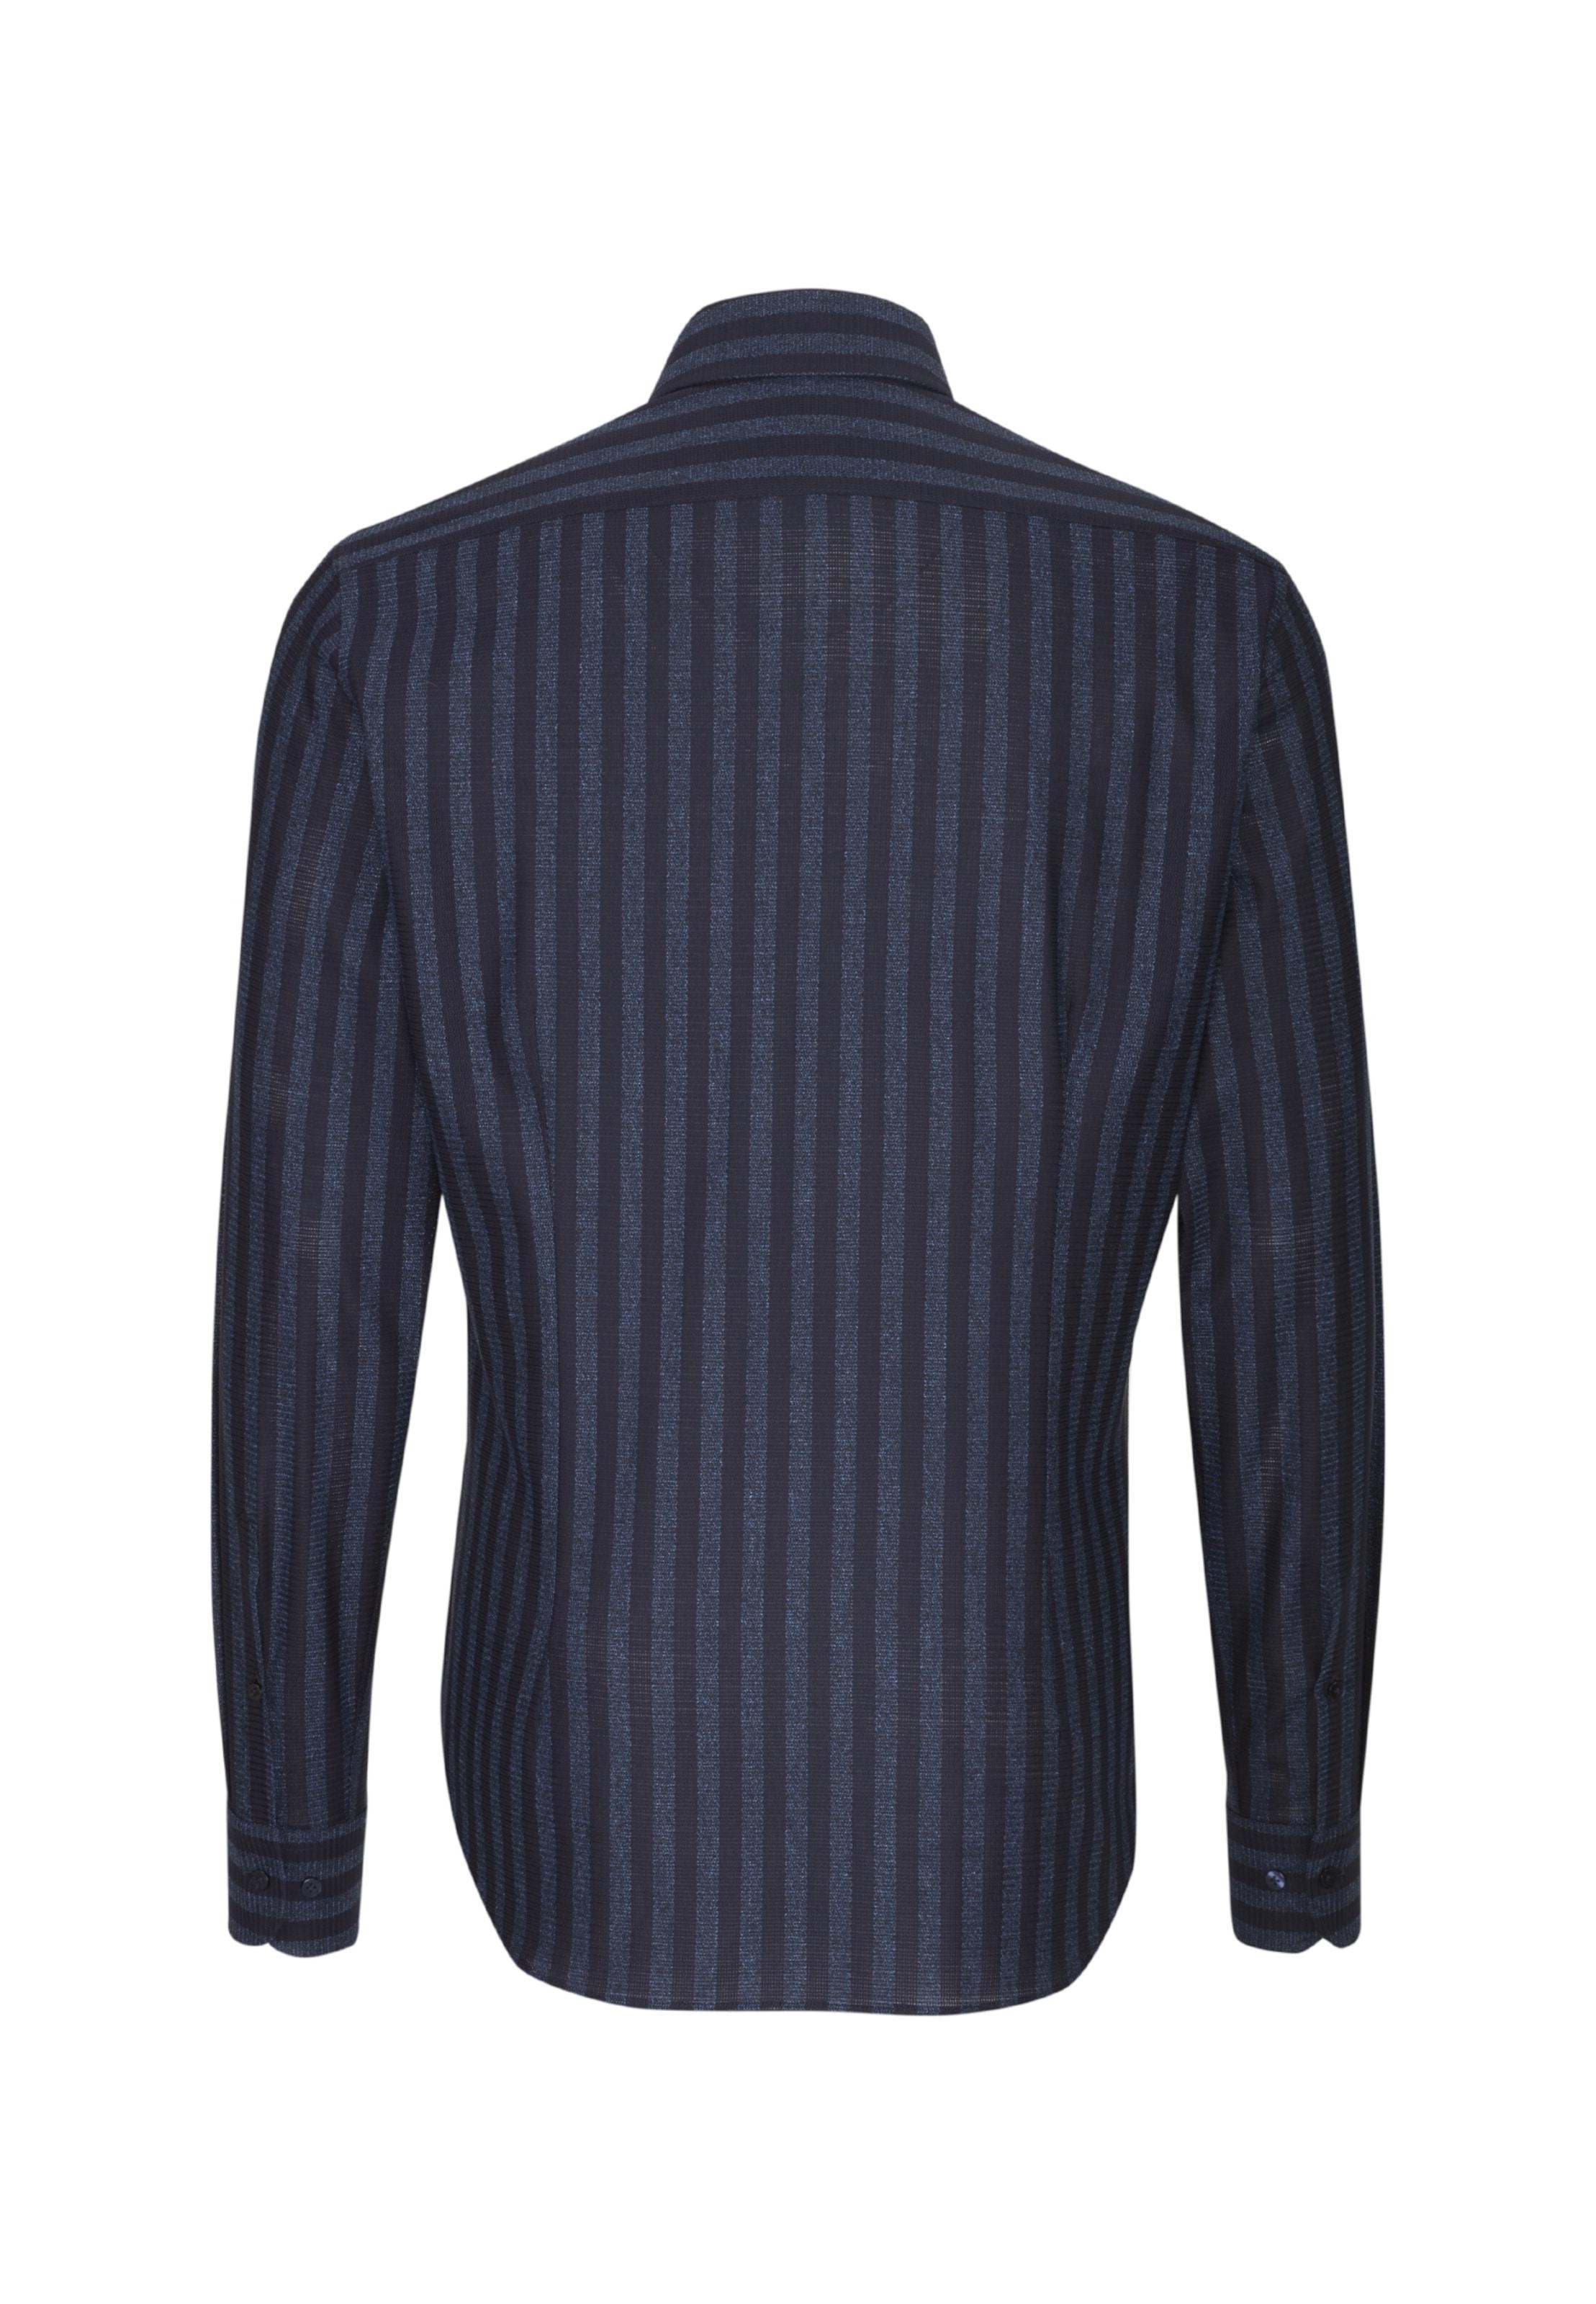 Jacques Casual NachtblauBlue Smart Hemd Denim In Britt TF1ulJ3cK